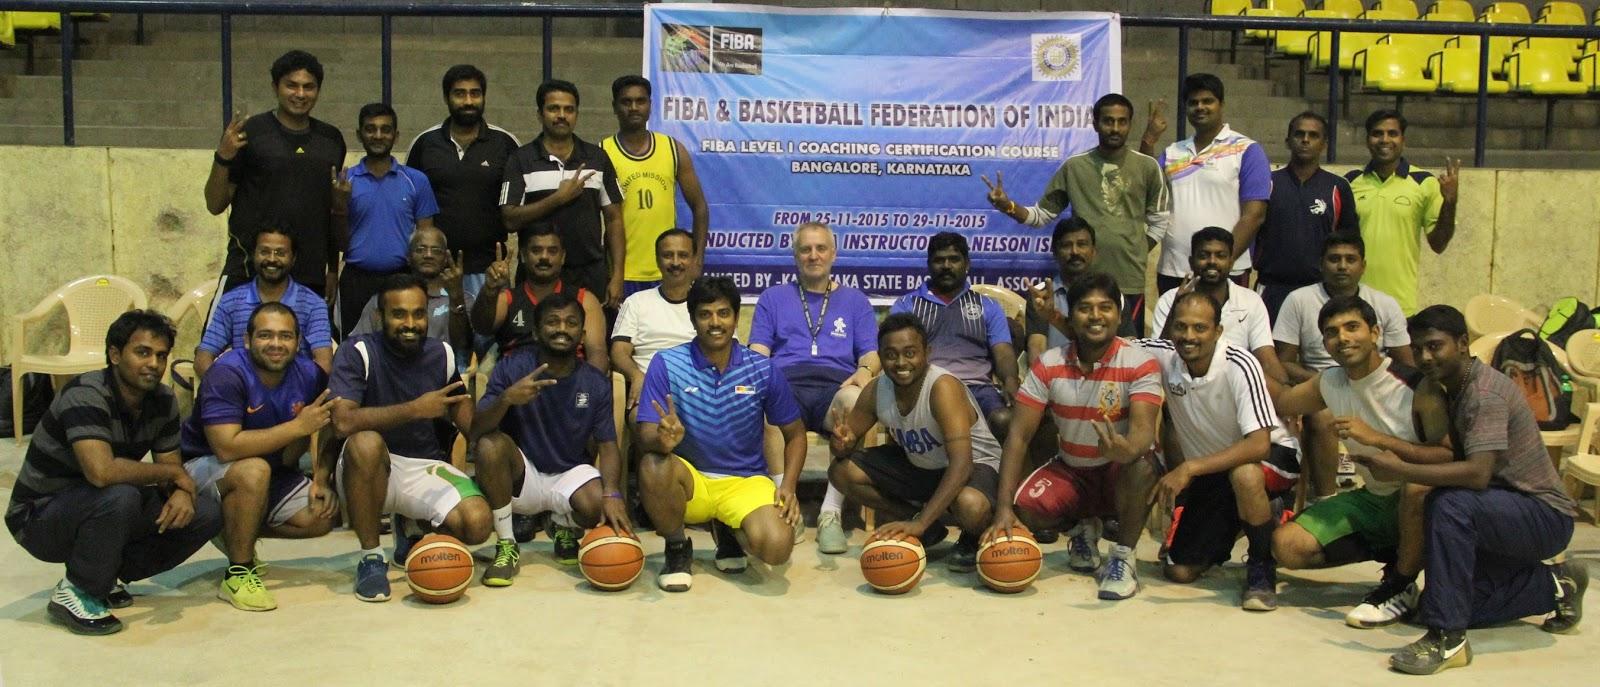 Hoopistani New Cycle Of Fiba Coaching Certification Courses